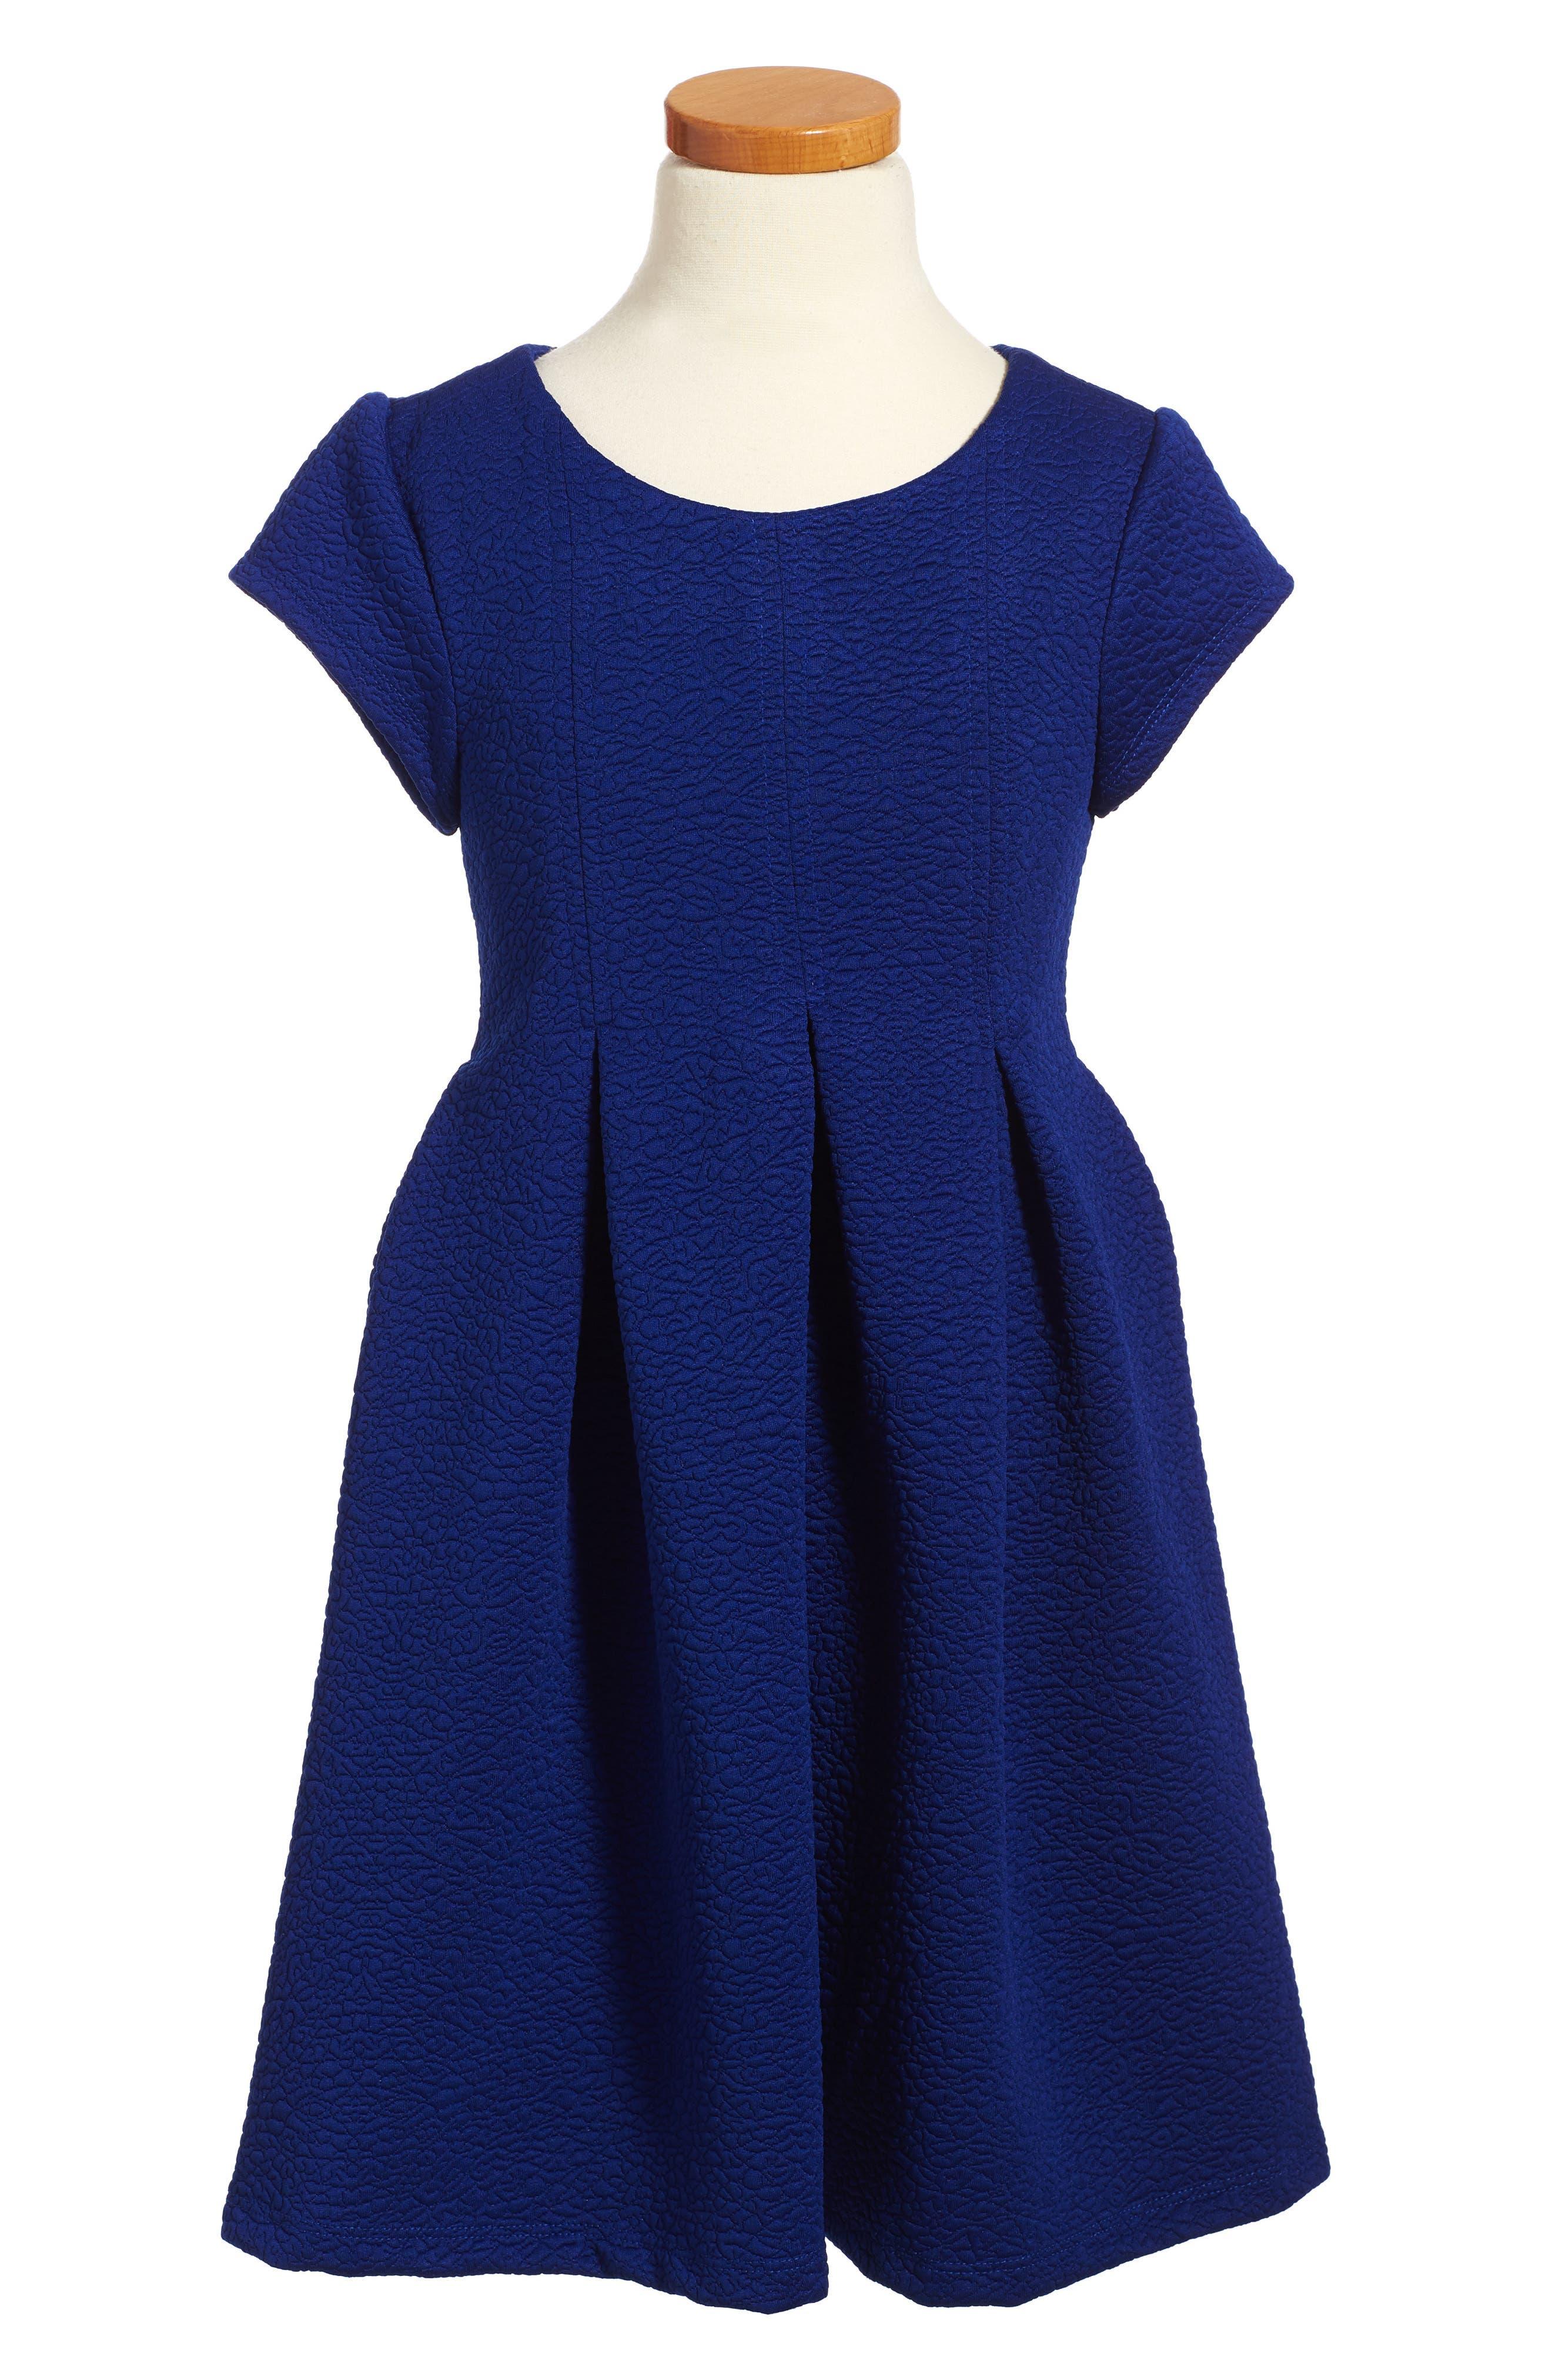 Pleated Knit Dress,                             Main thumbnail 1, color,                             Royal